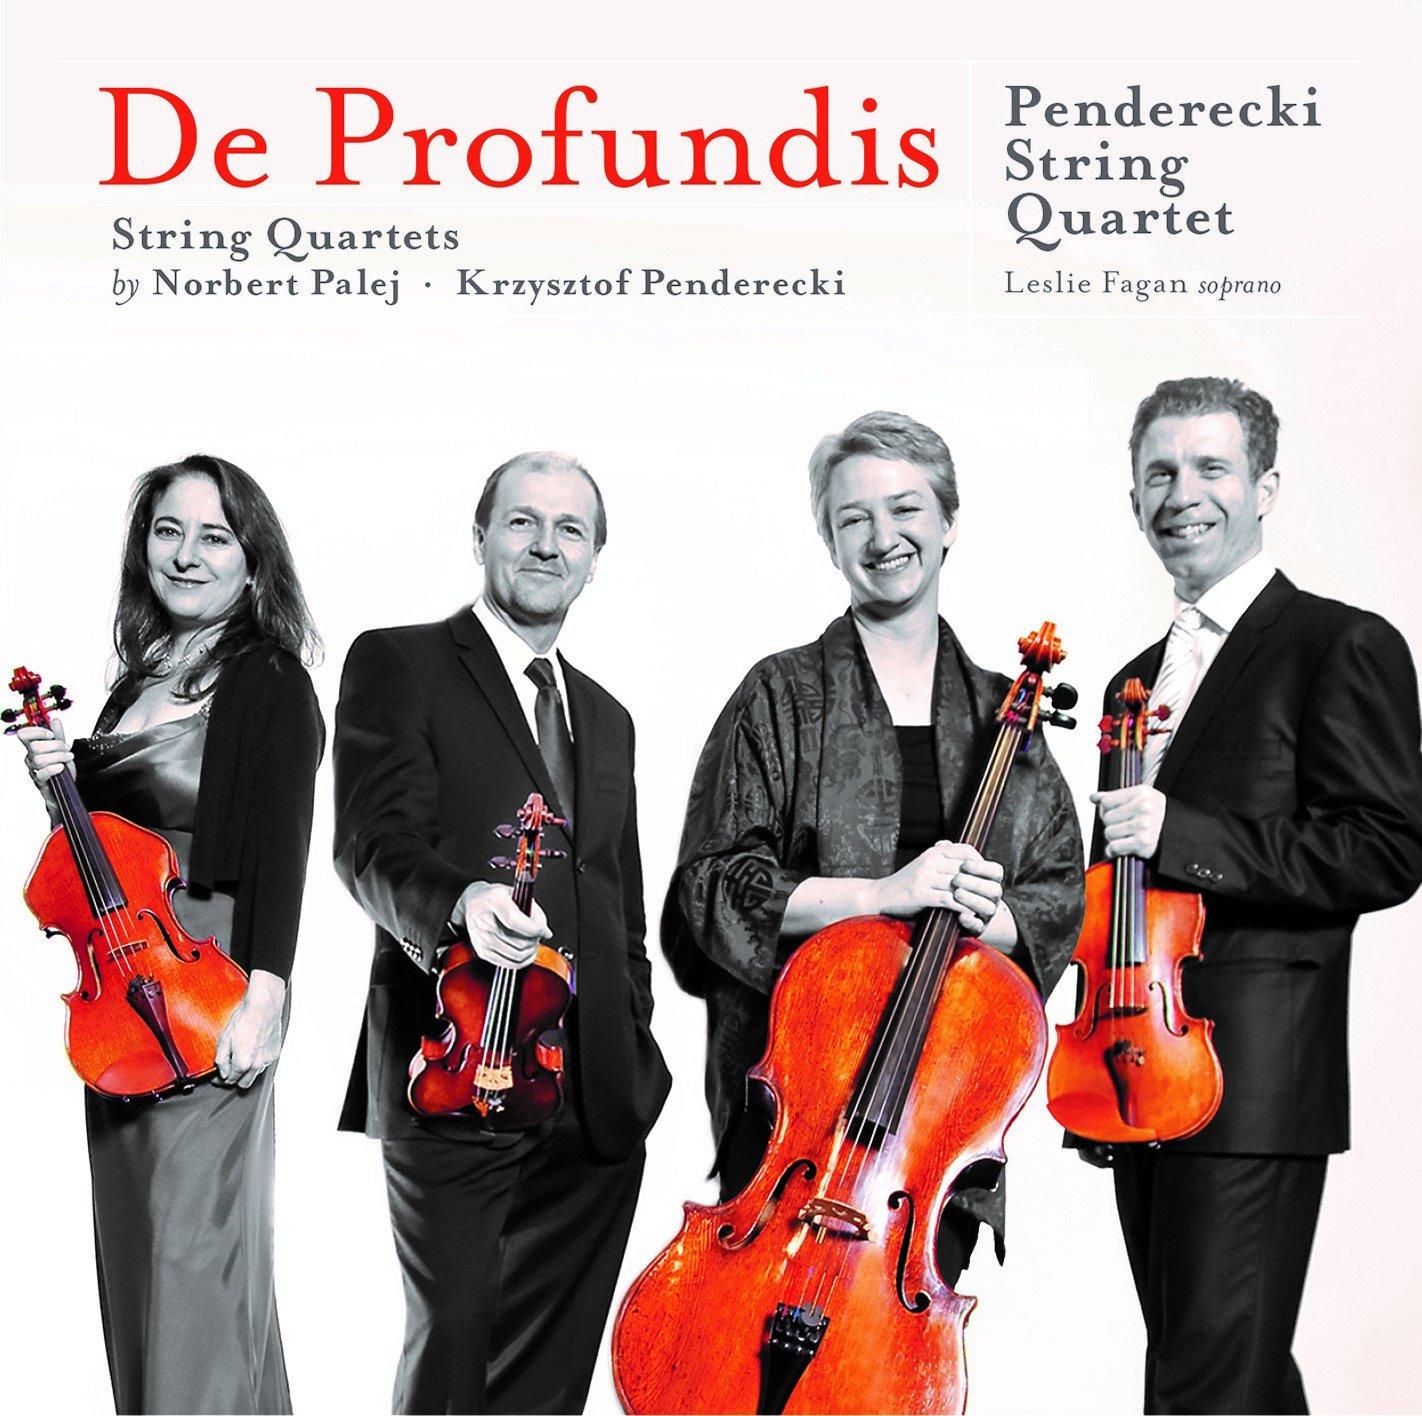 De Profundis by Penderecki String Quartet